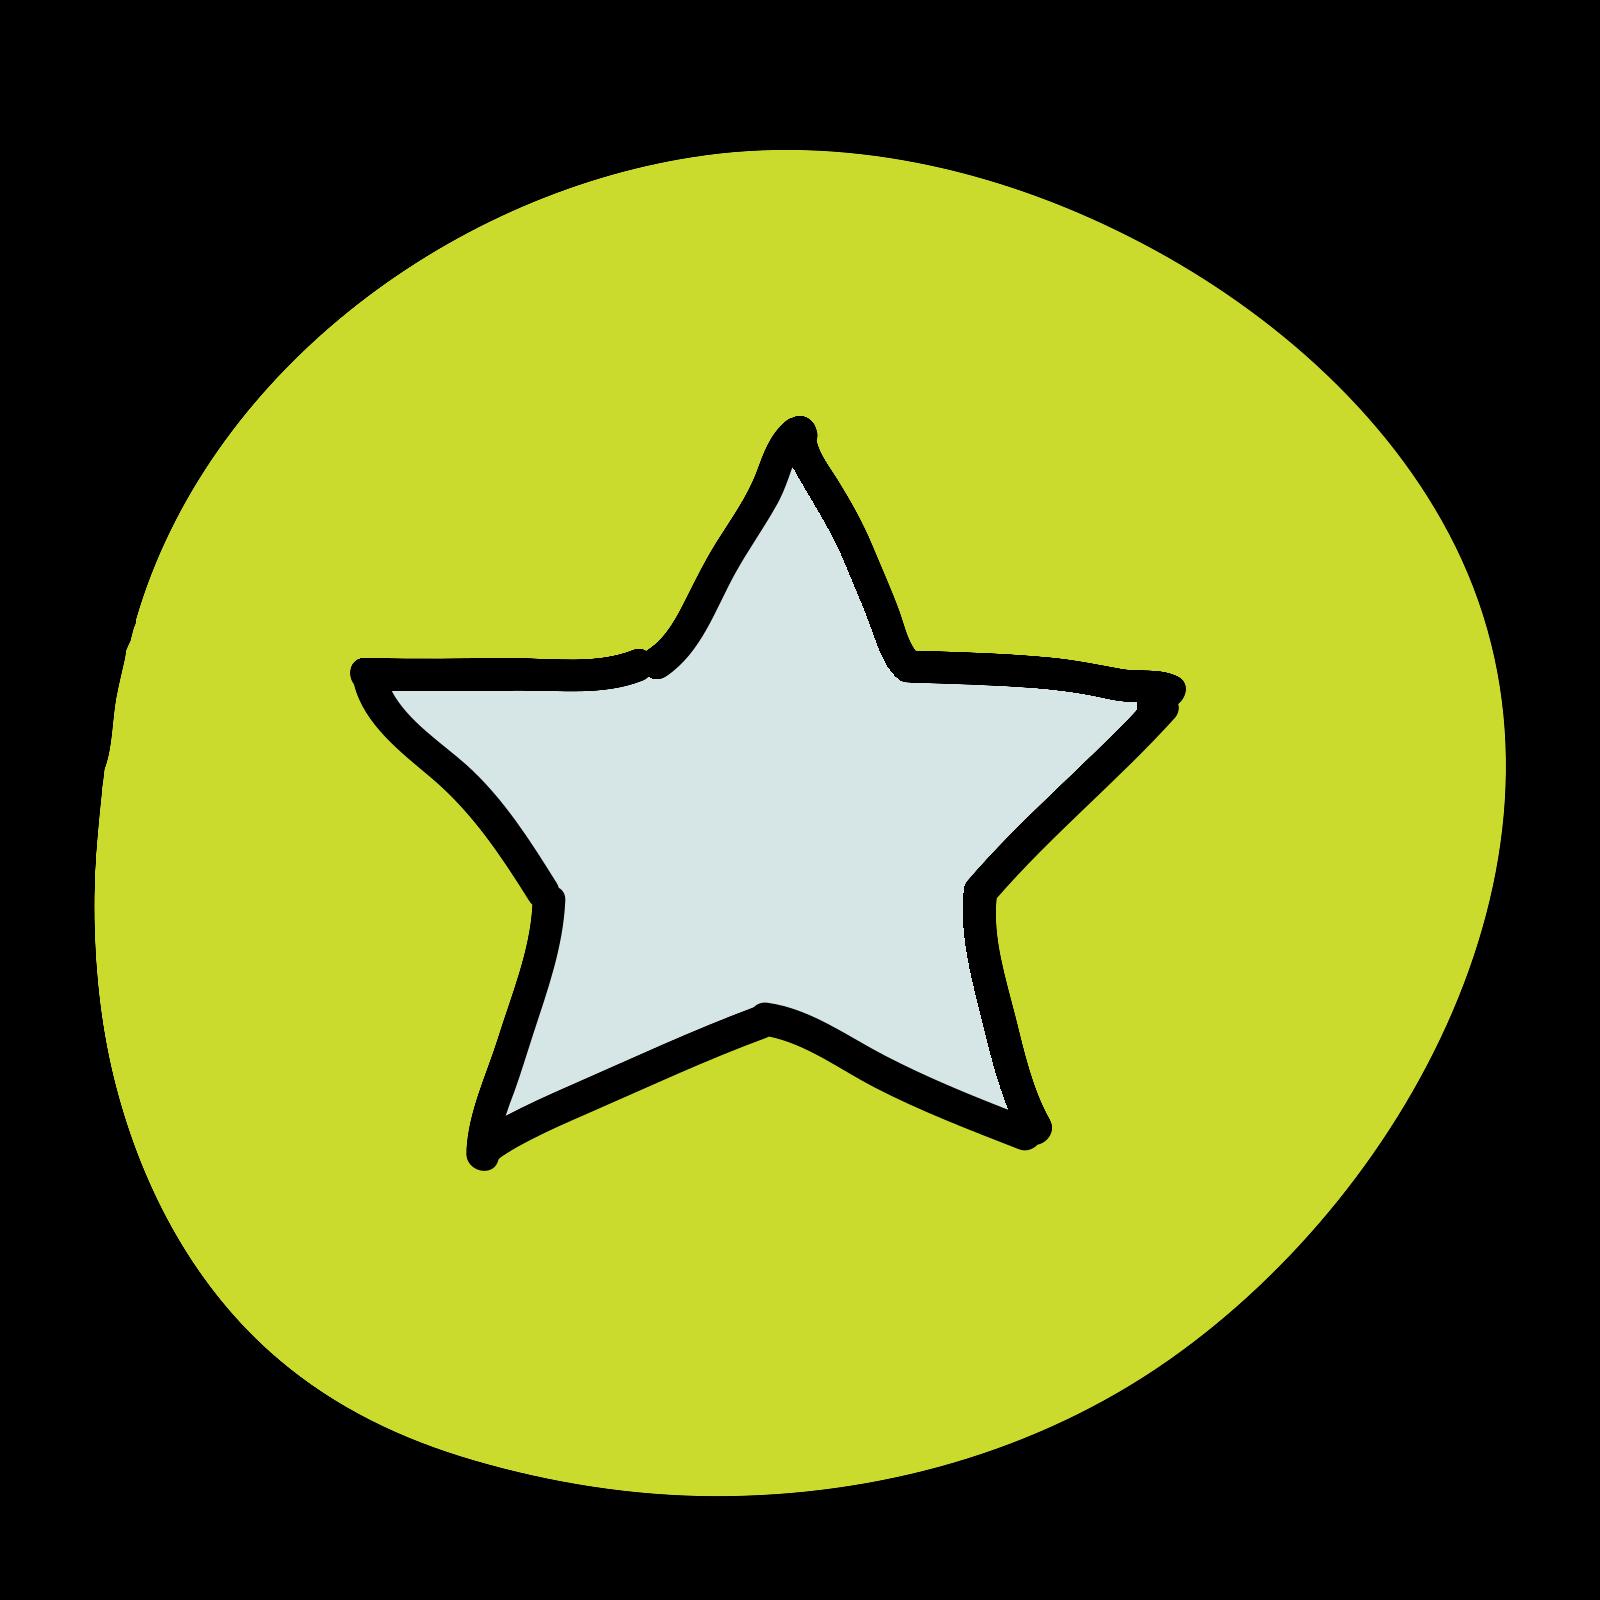 Logo gwiazdy icon